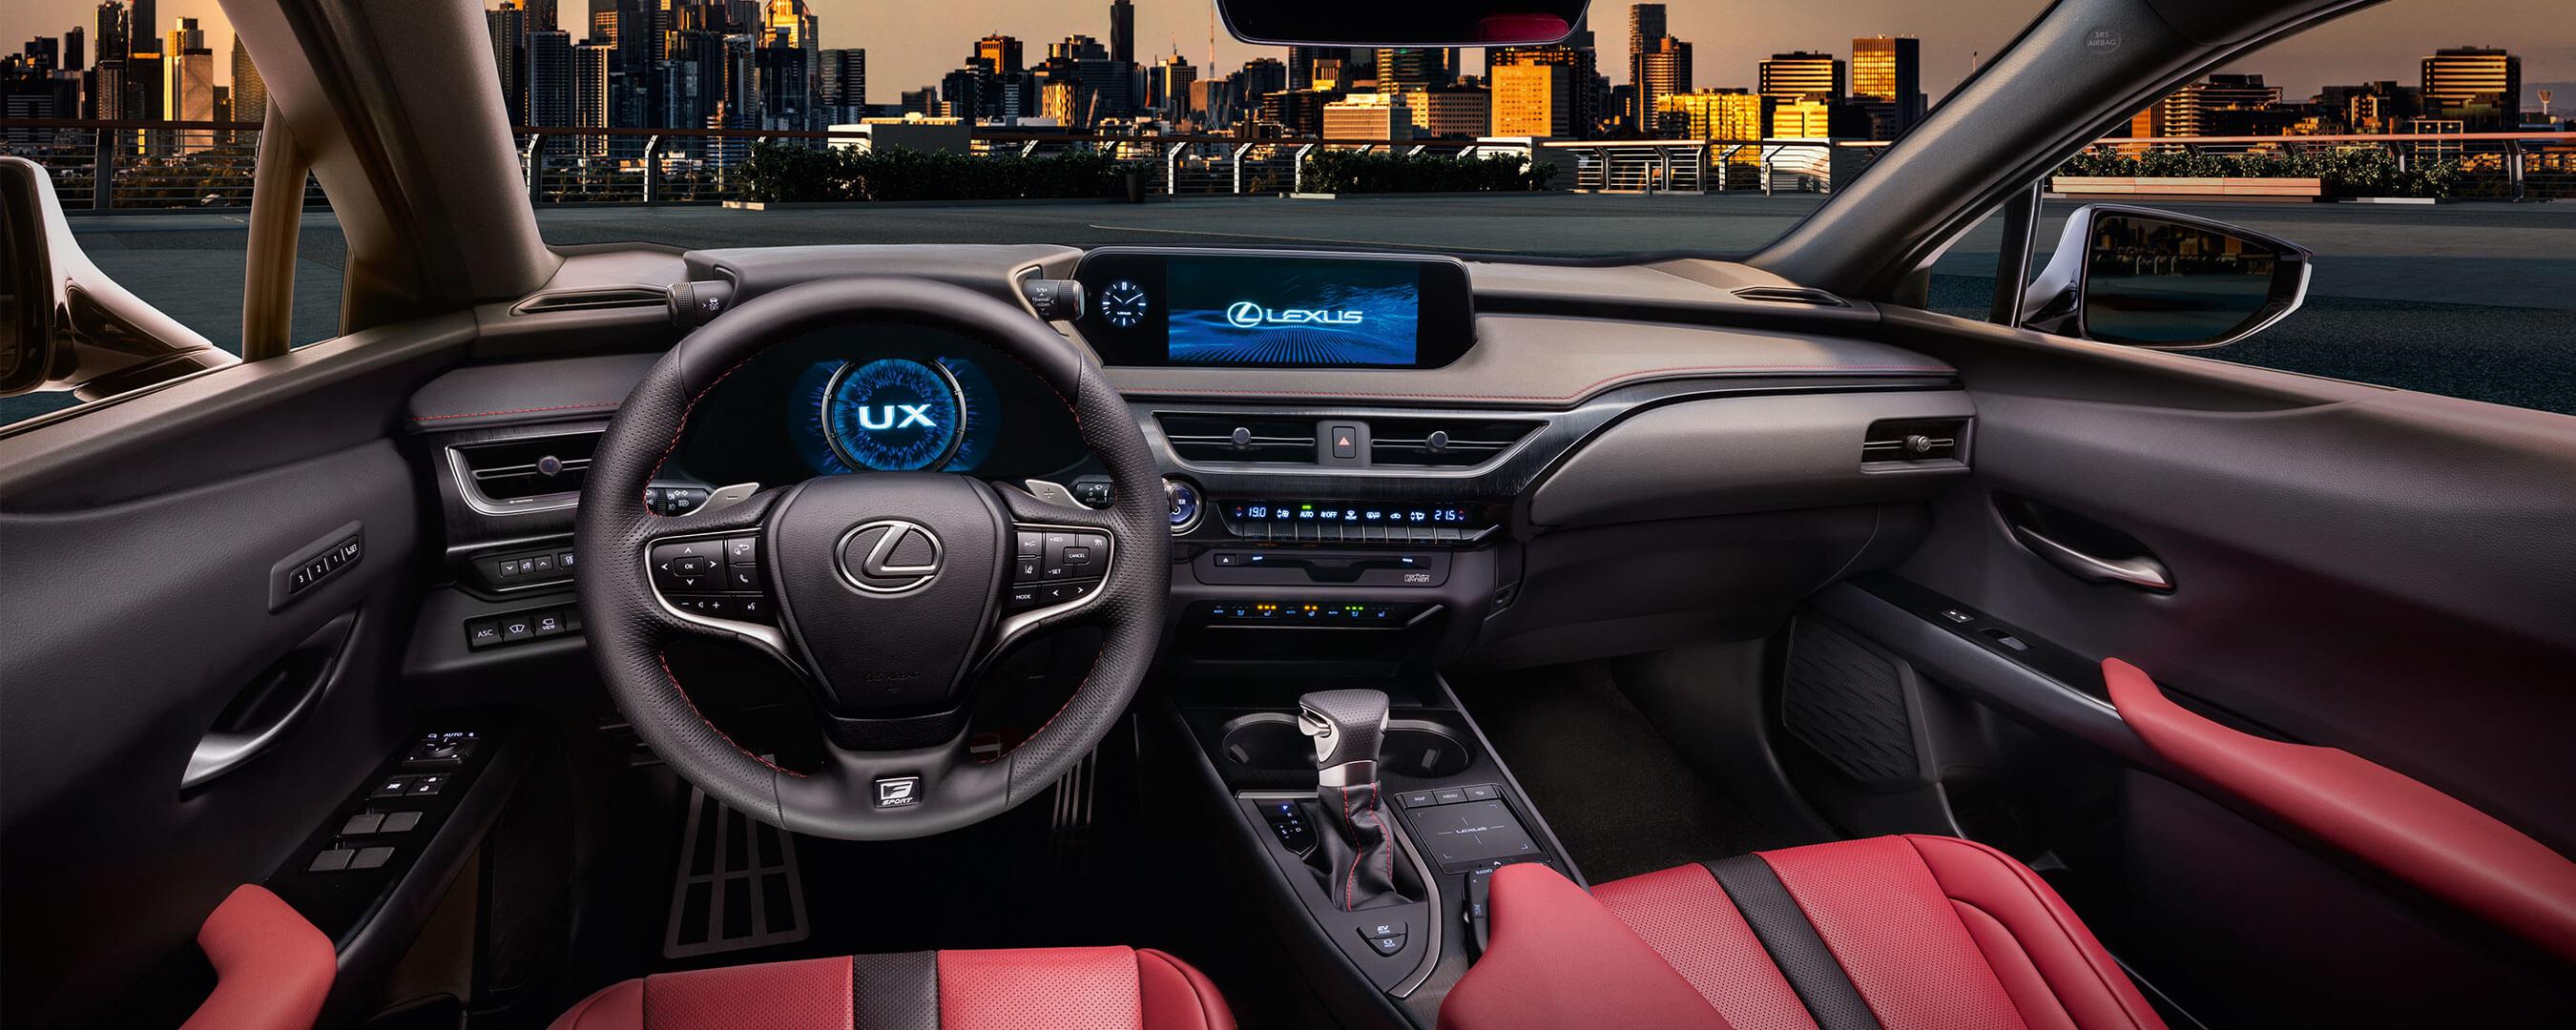 2018 lexus ux experience interior front